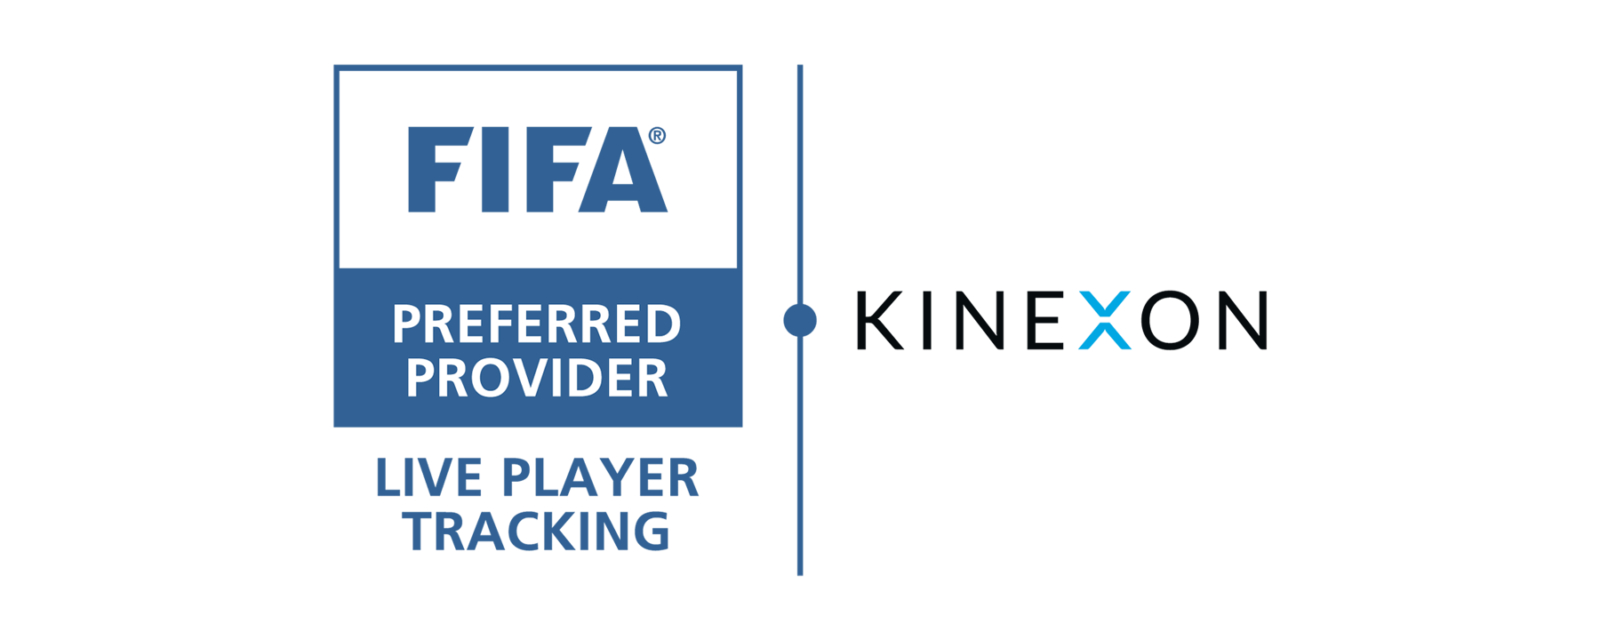 KINEXON X FIFA Logo